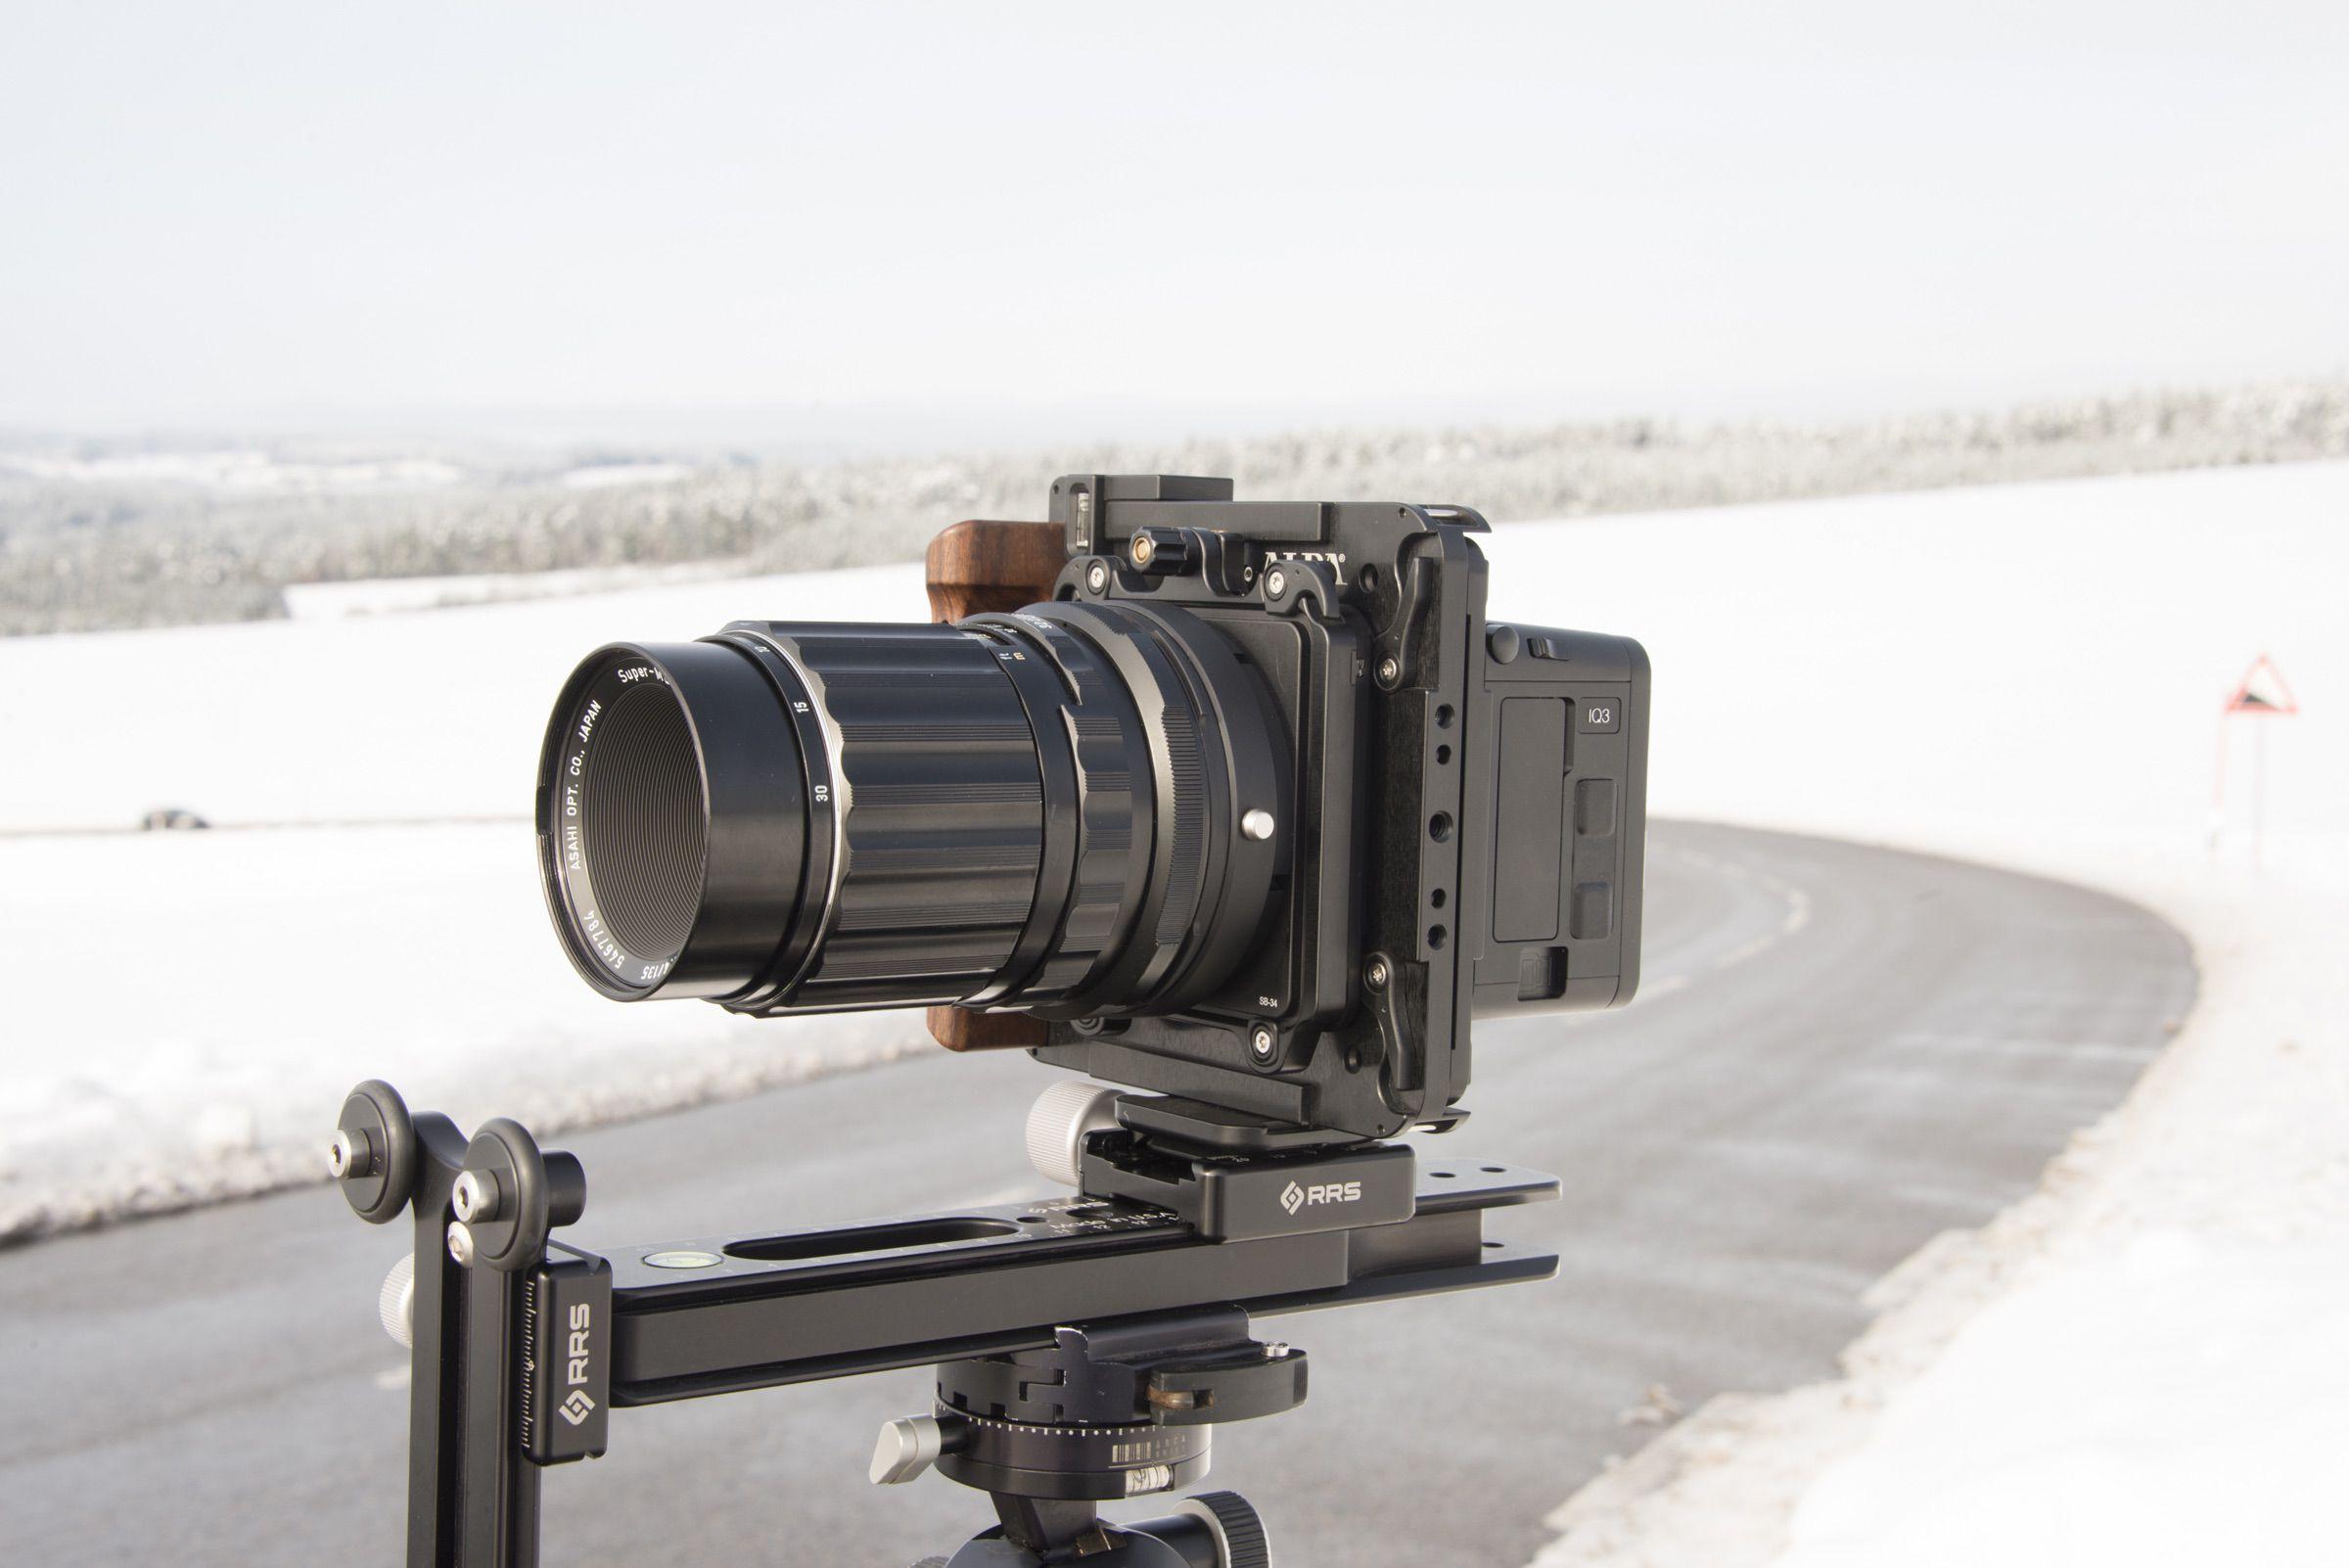 ALPA 12 STC with Pentax SMC Makro Takumar 6X7 4.0/135mm